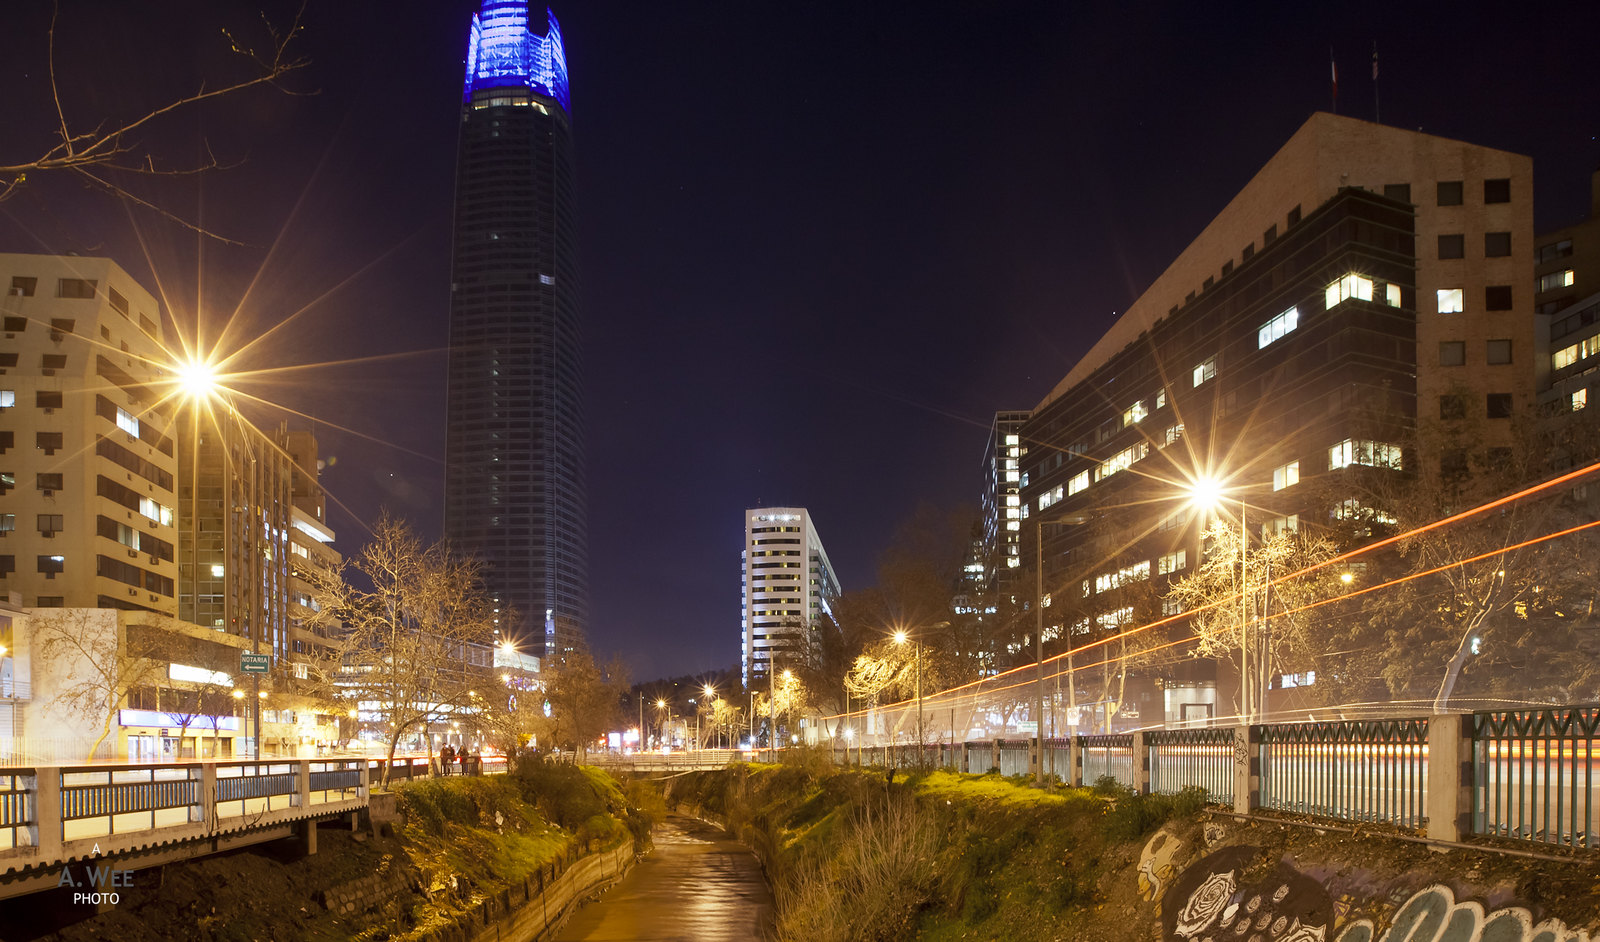 Providencia at night